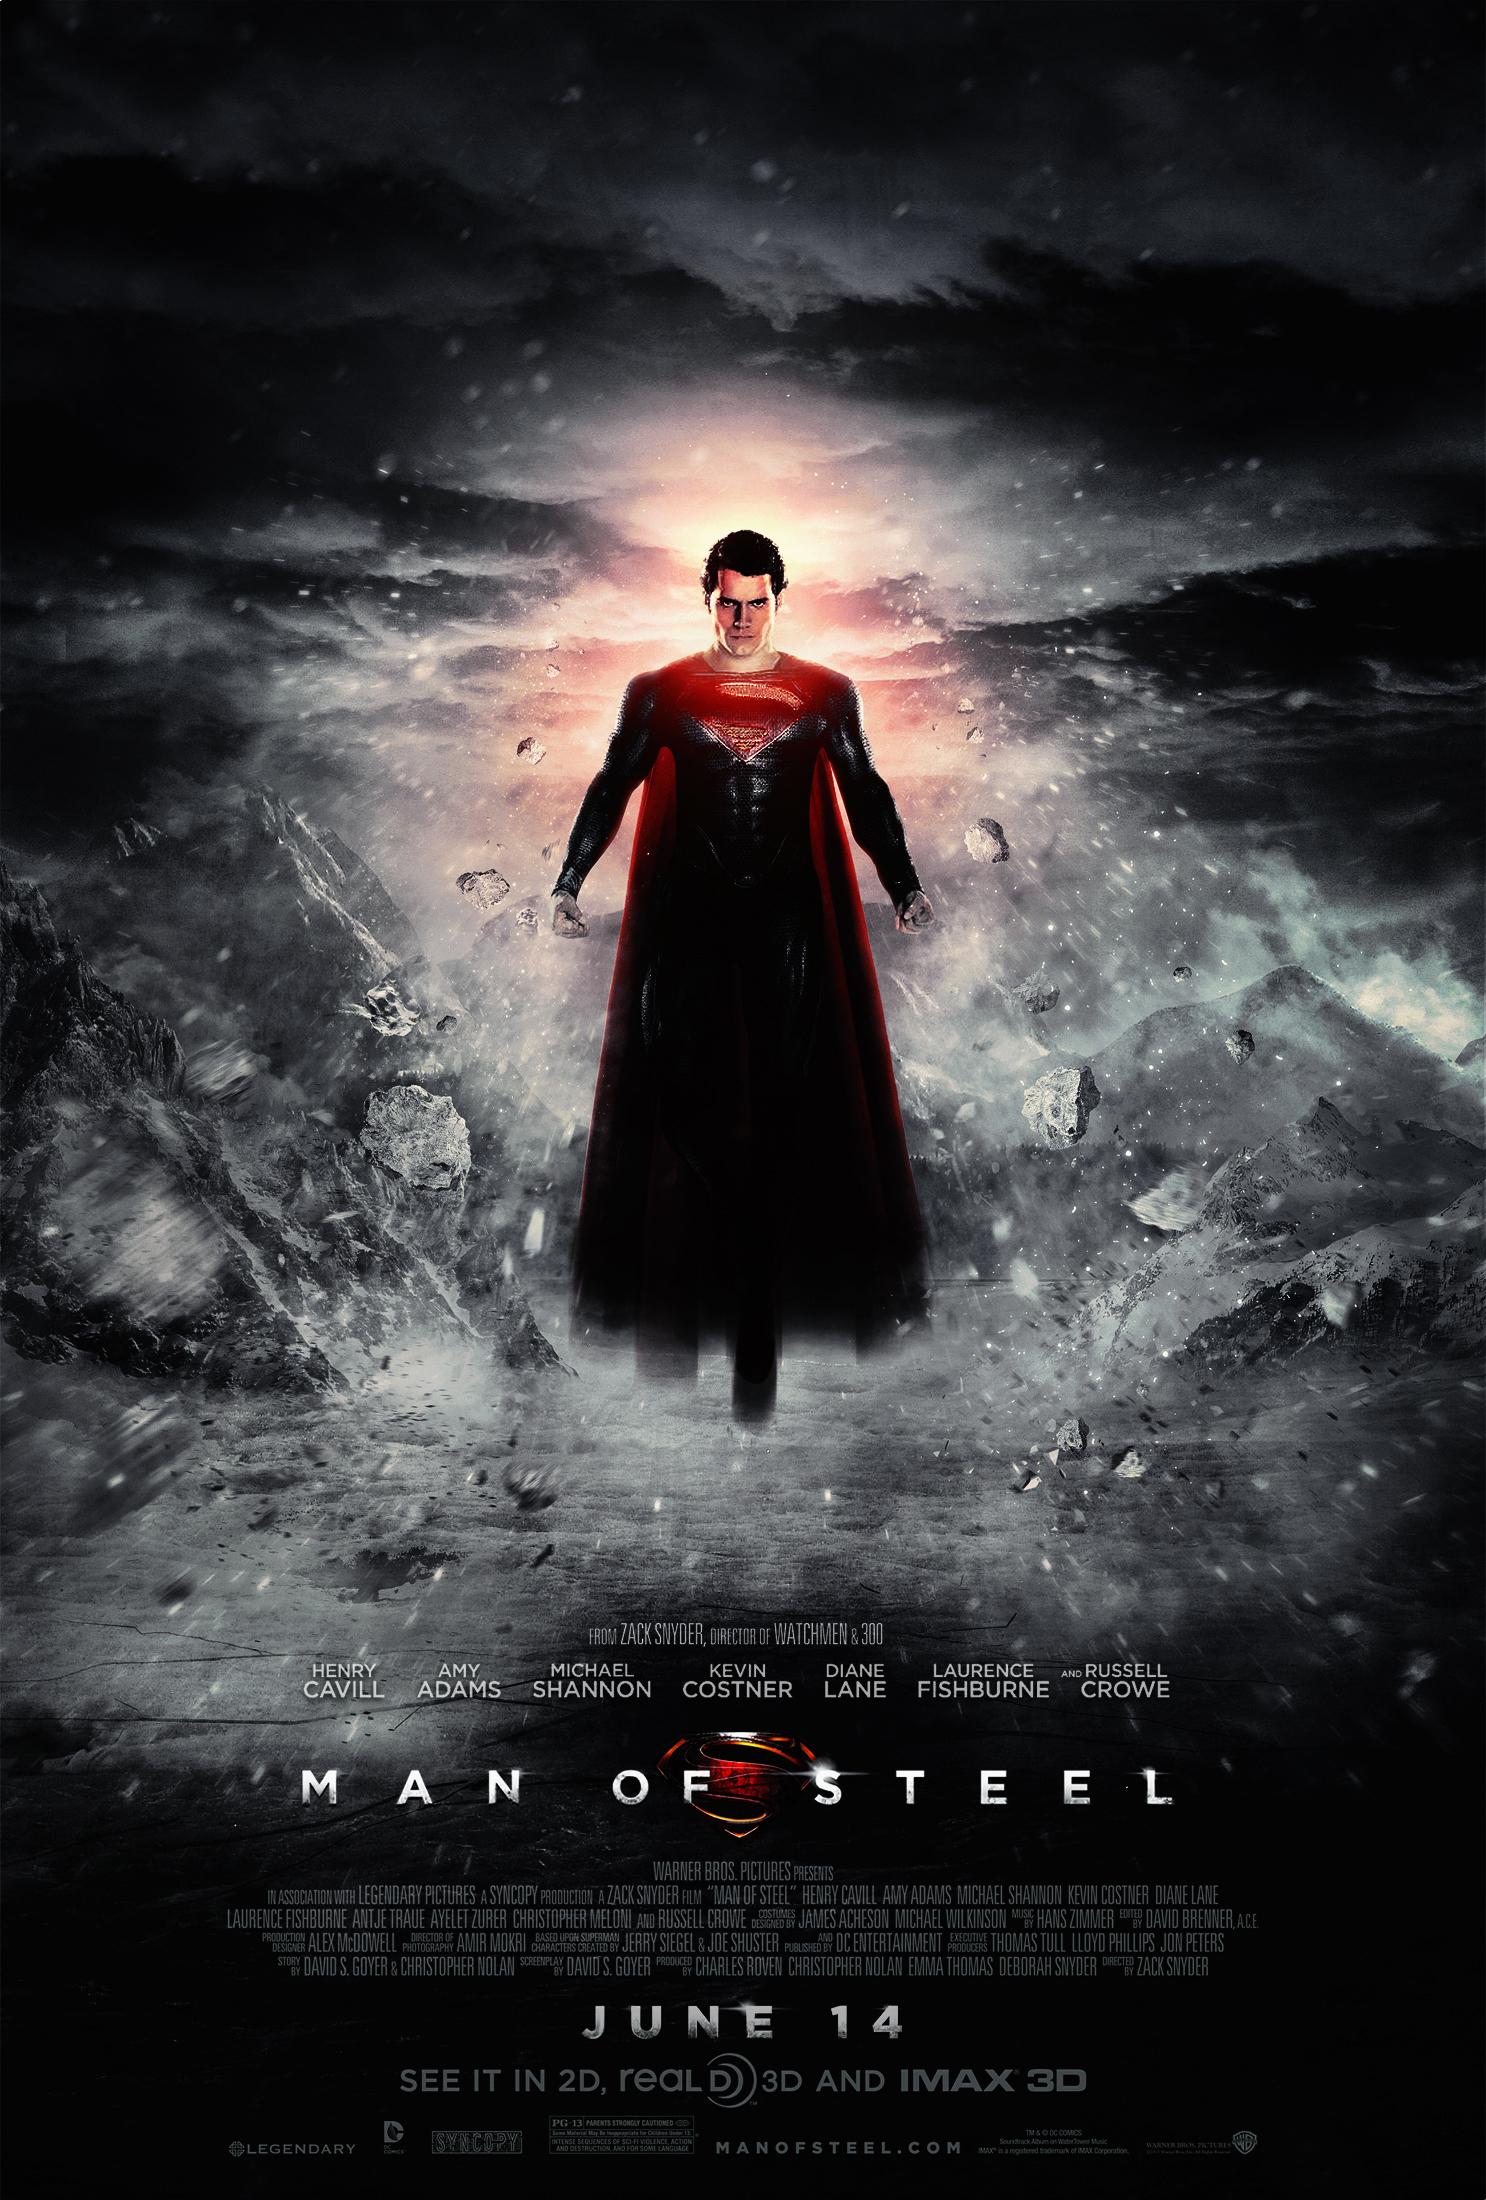 Man of Steel Poster 4 Grey by visuasys on DeviantArt